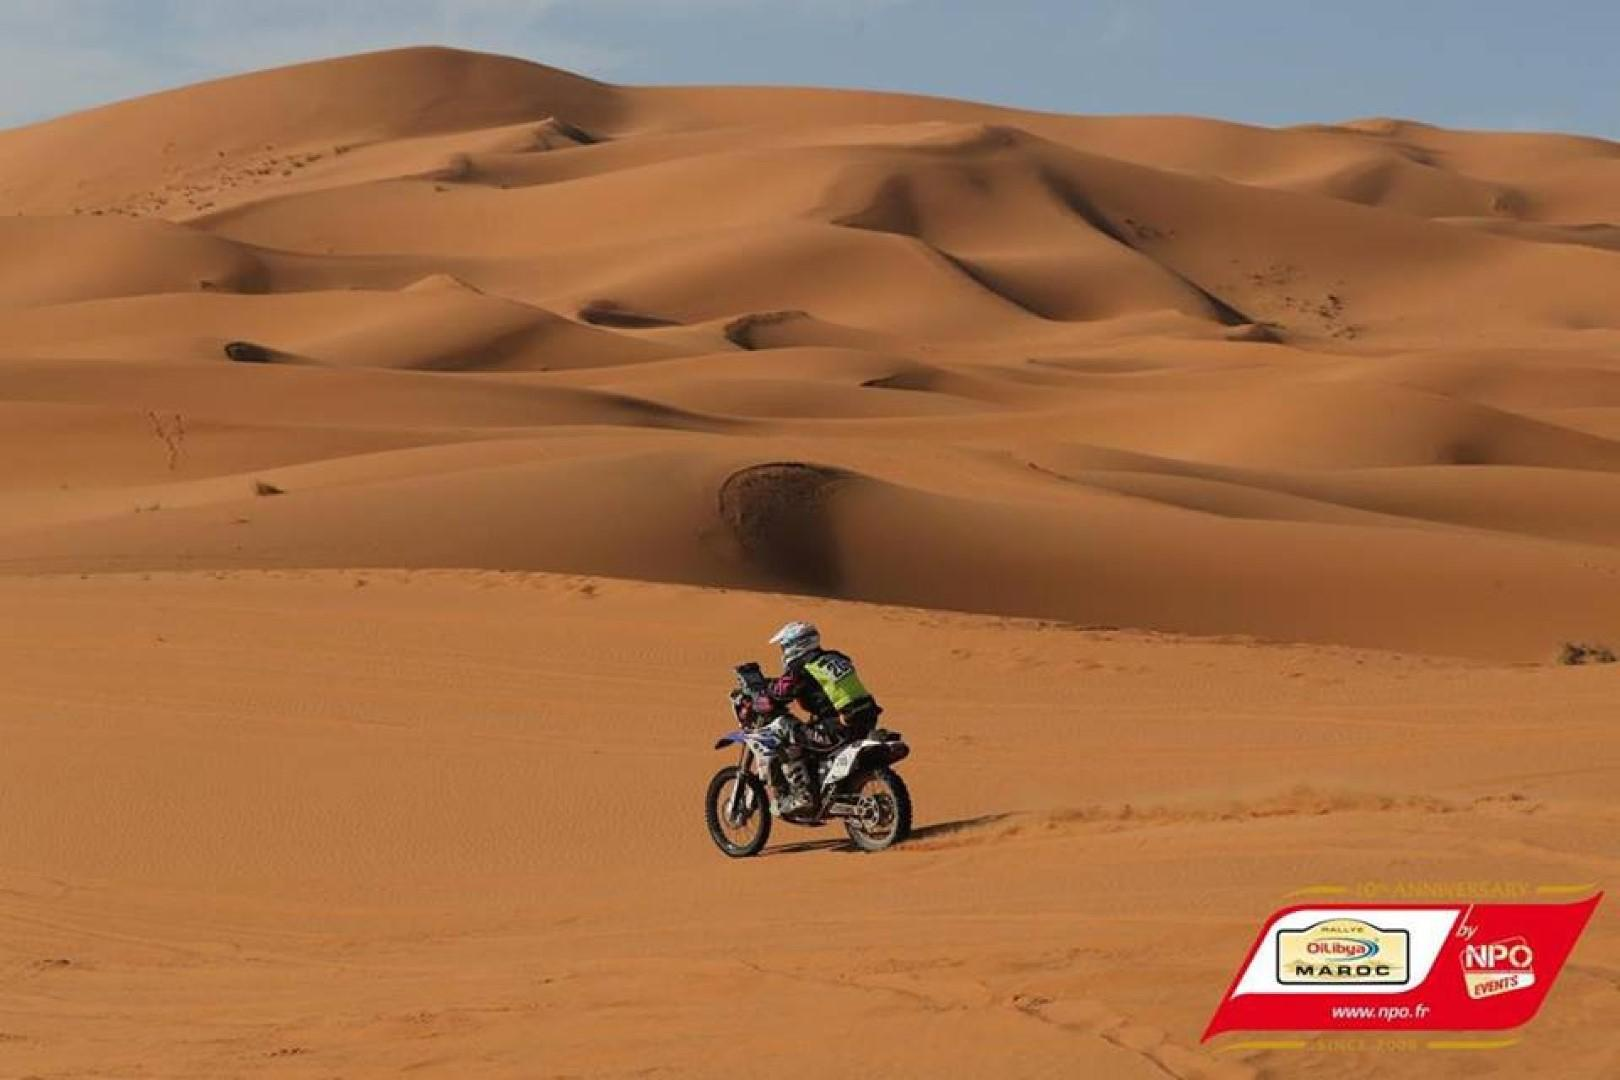 Participation du marocain Abdelghani OUAFI au Rallye OiLibya du Maroc 2017.